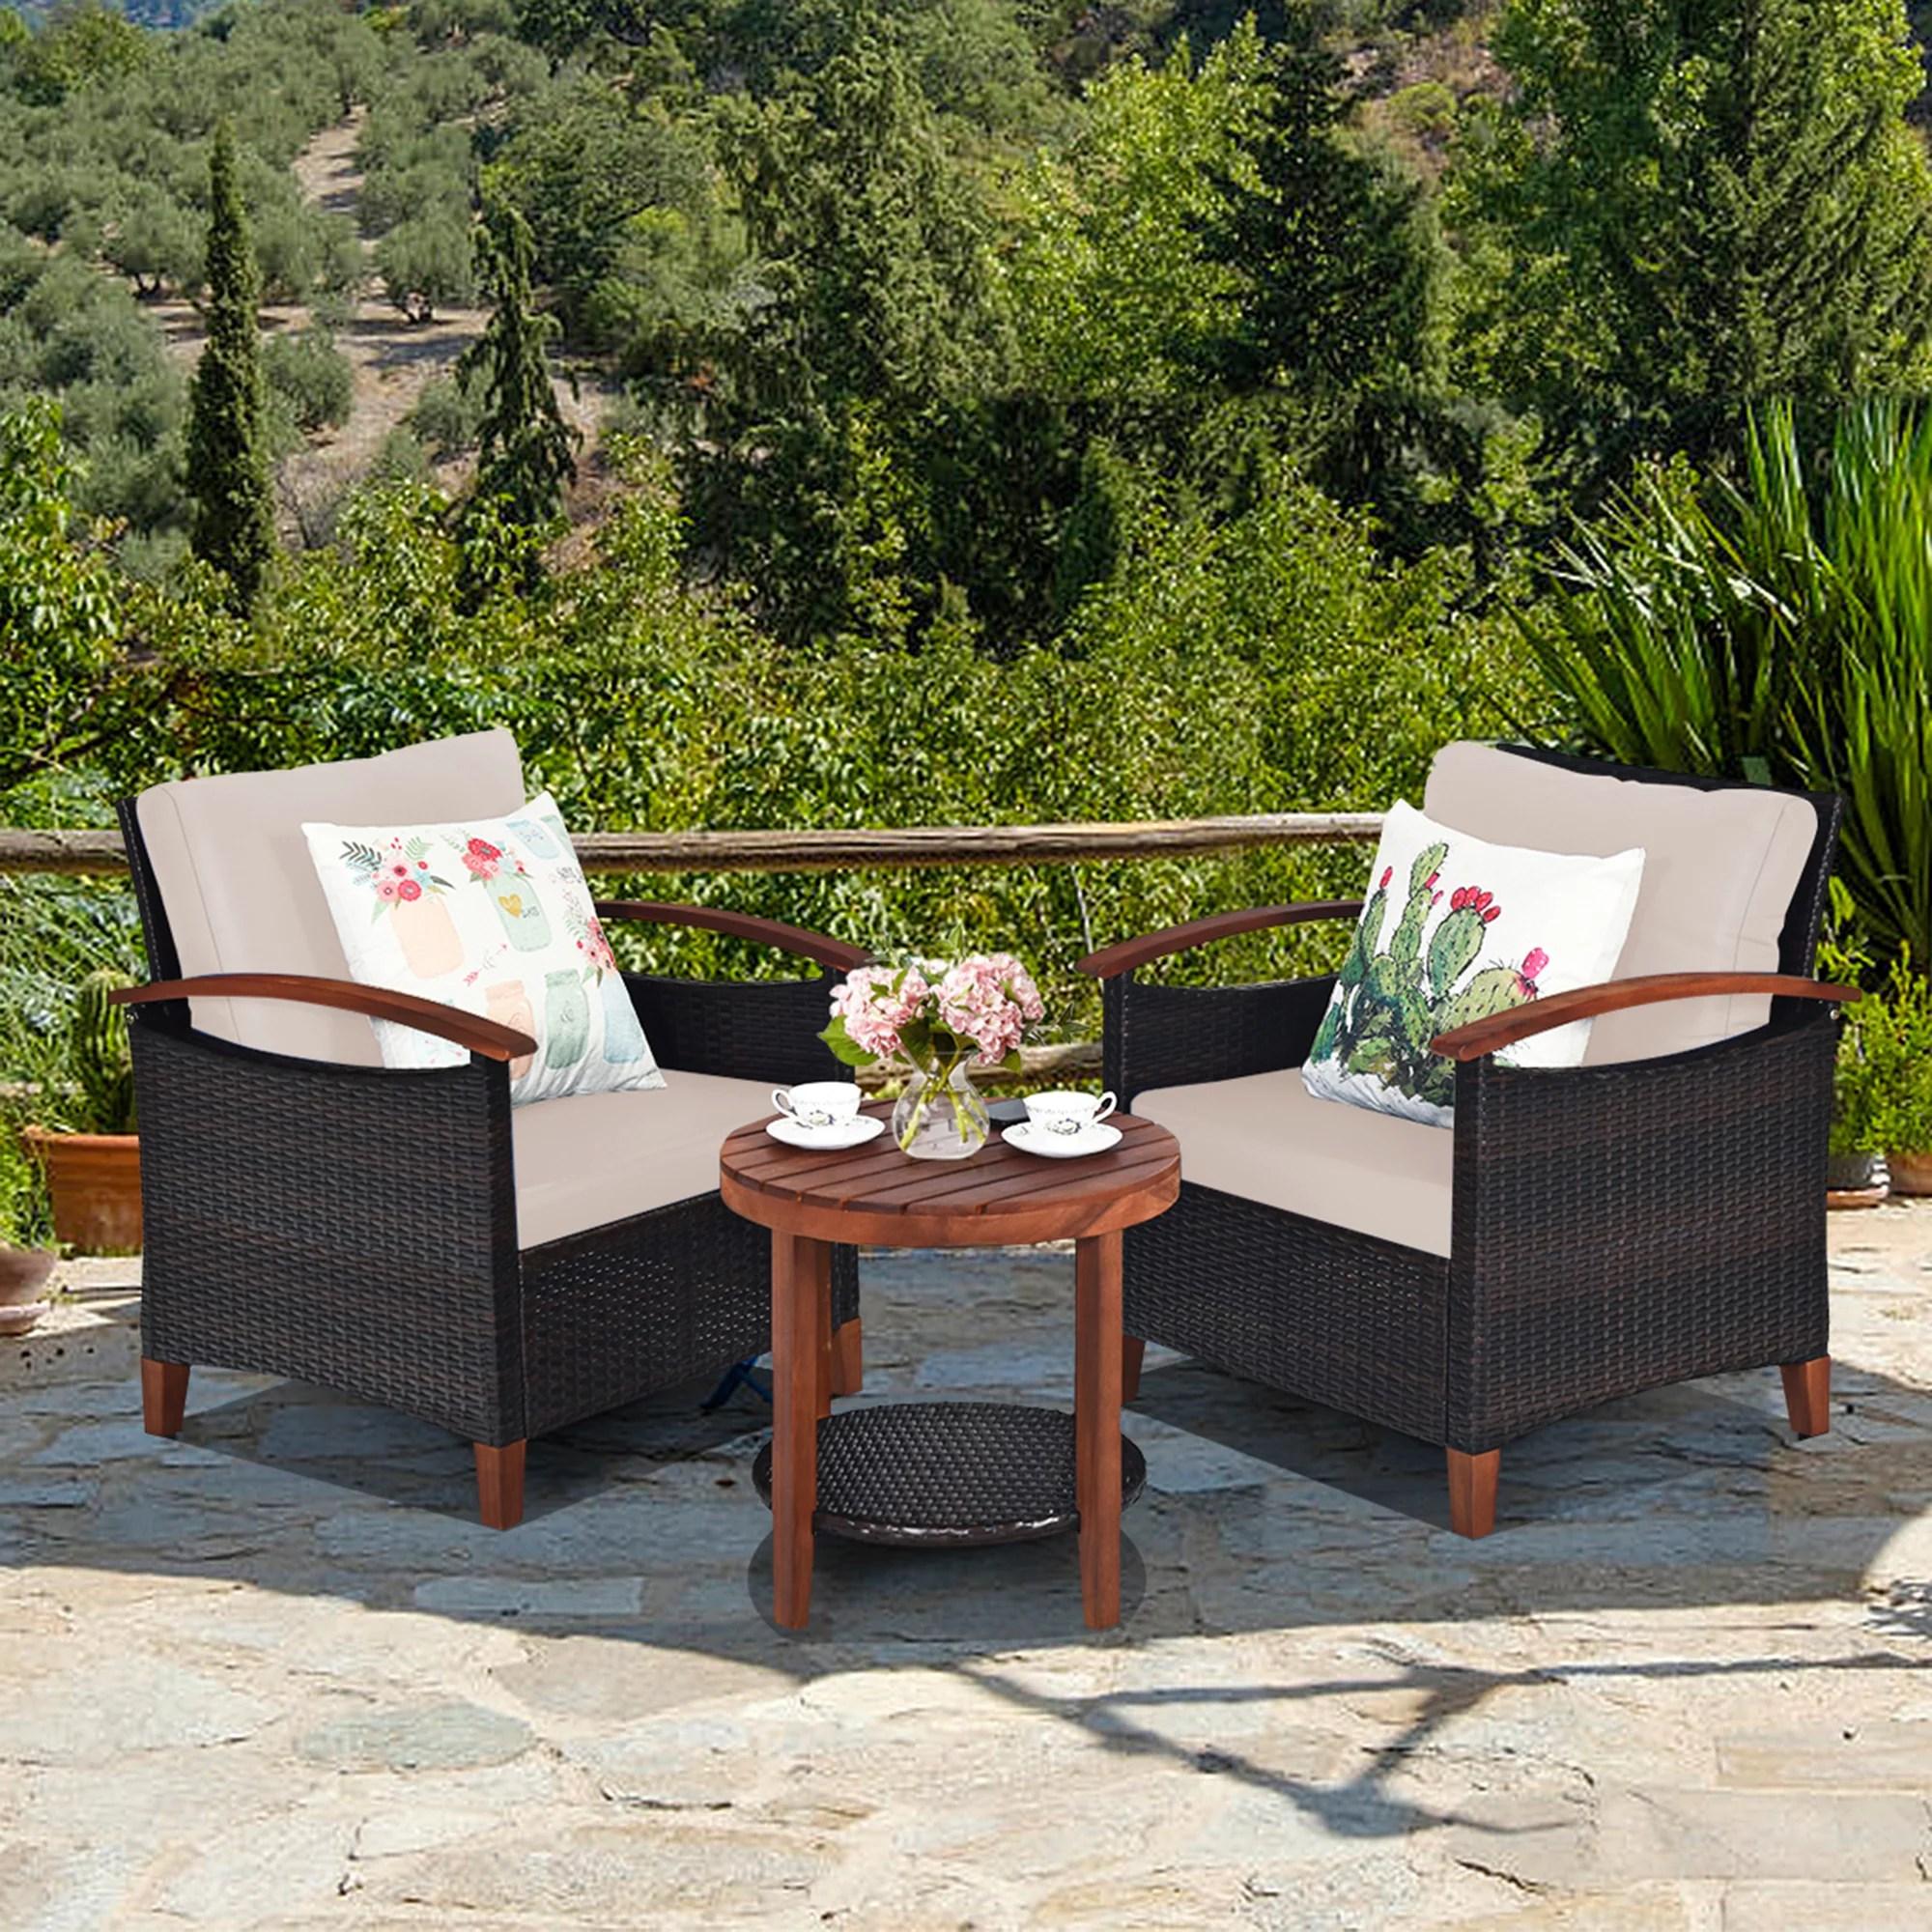 gymax 3pcs patio wicker rattan conversation set outdoor furniture set w beige cushion